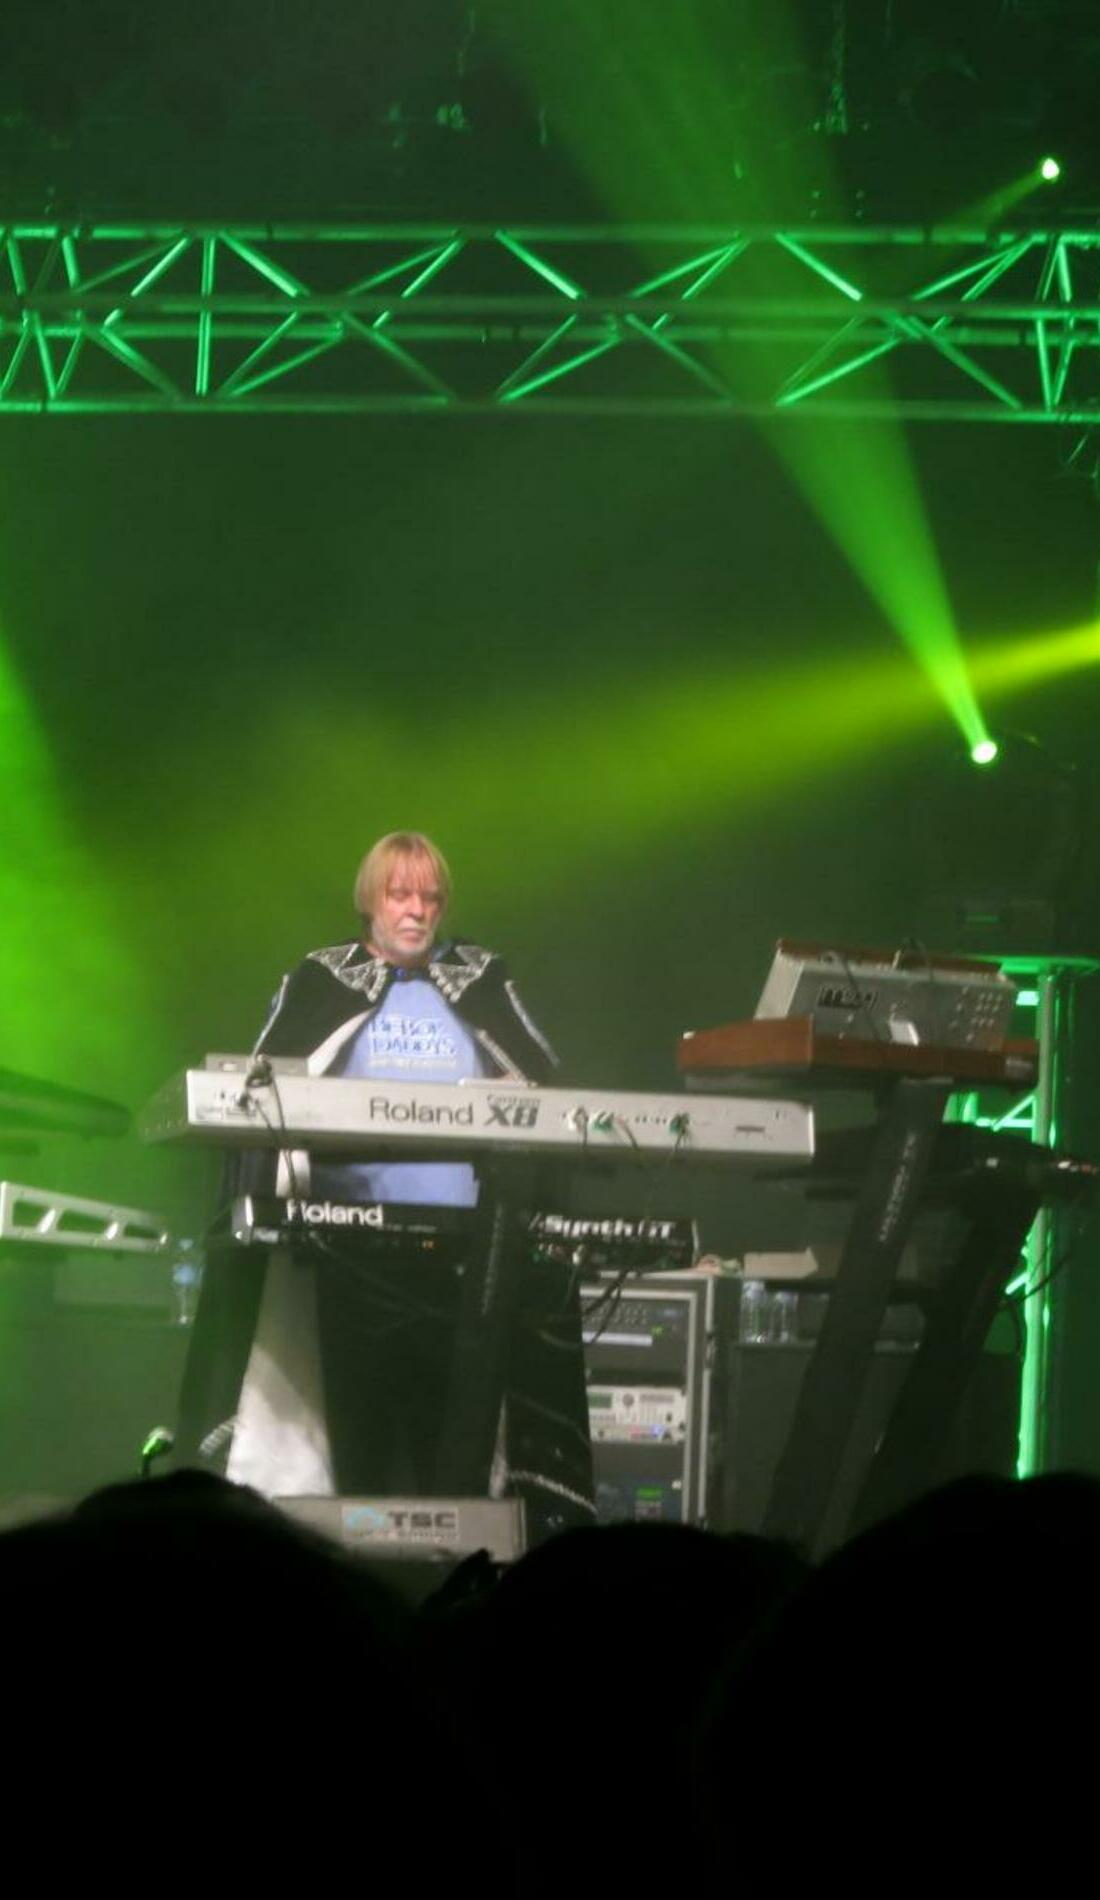 A Anderson, Rabin & Wakeman (ARW) live event